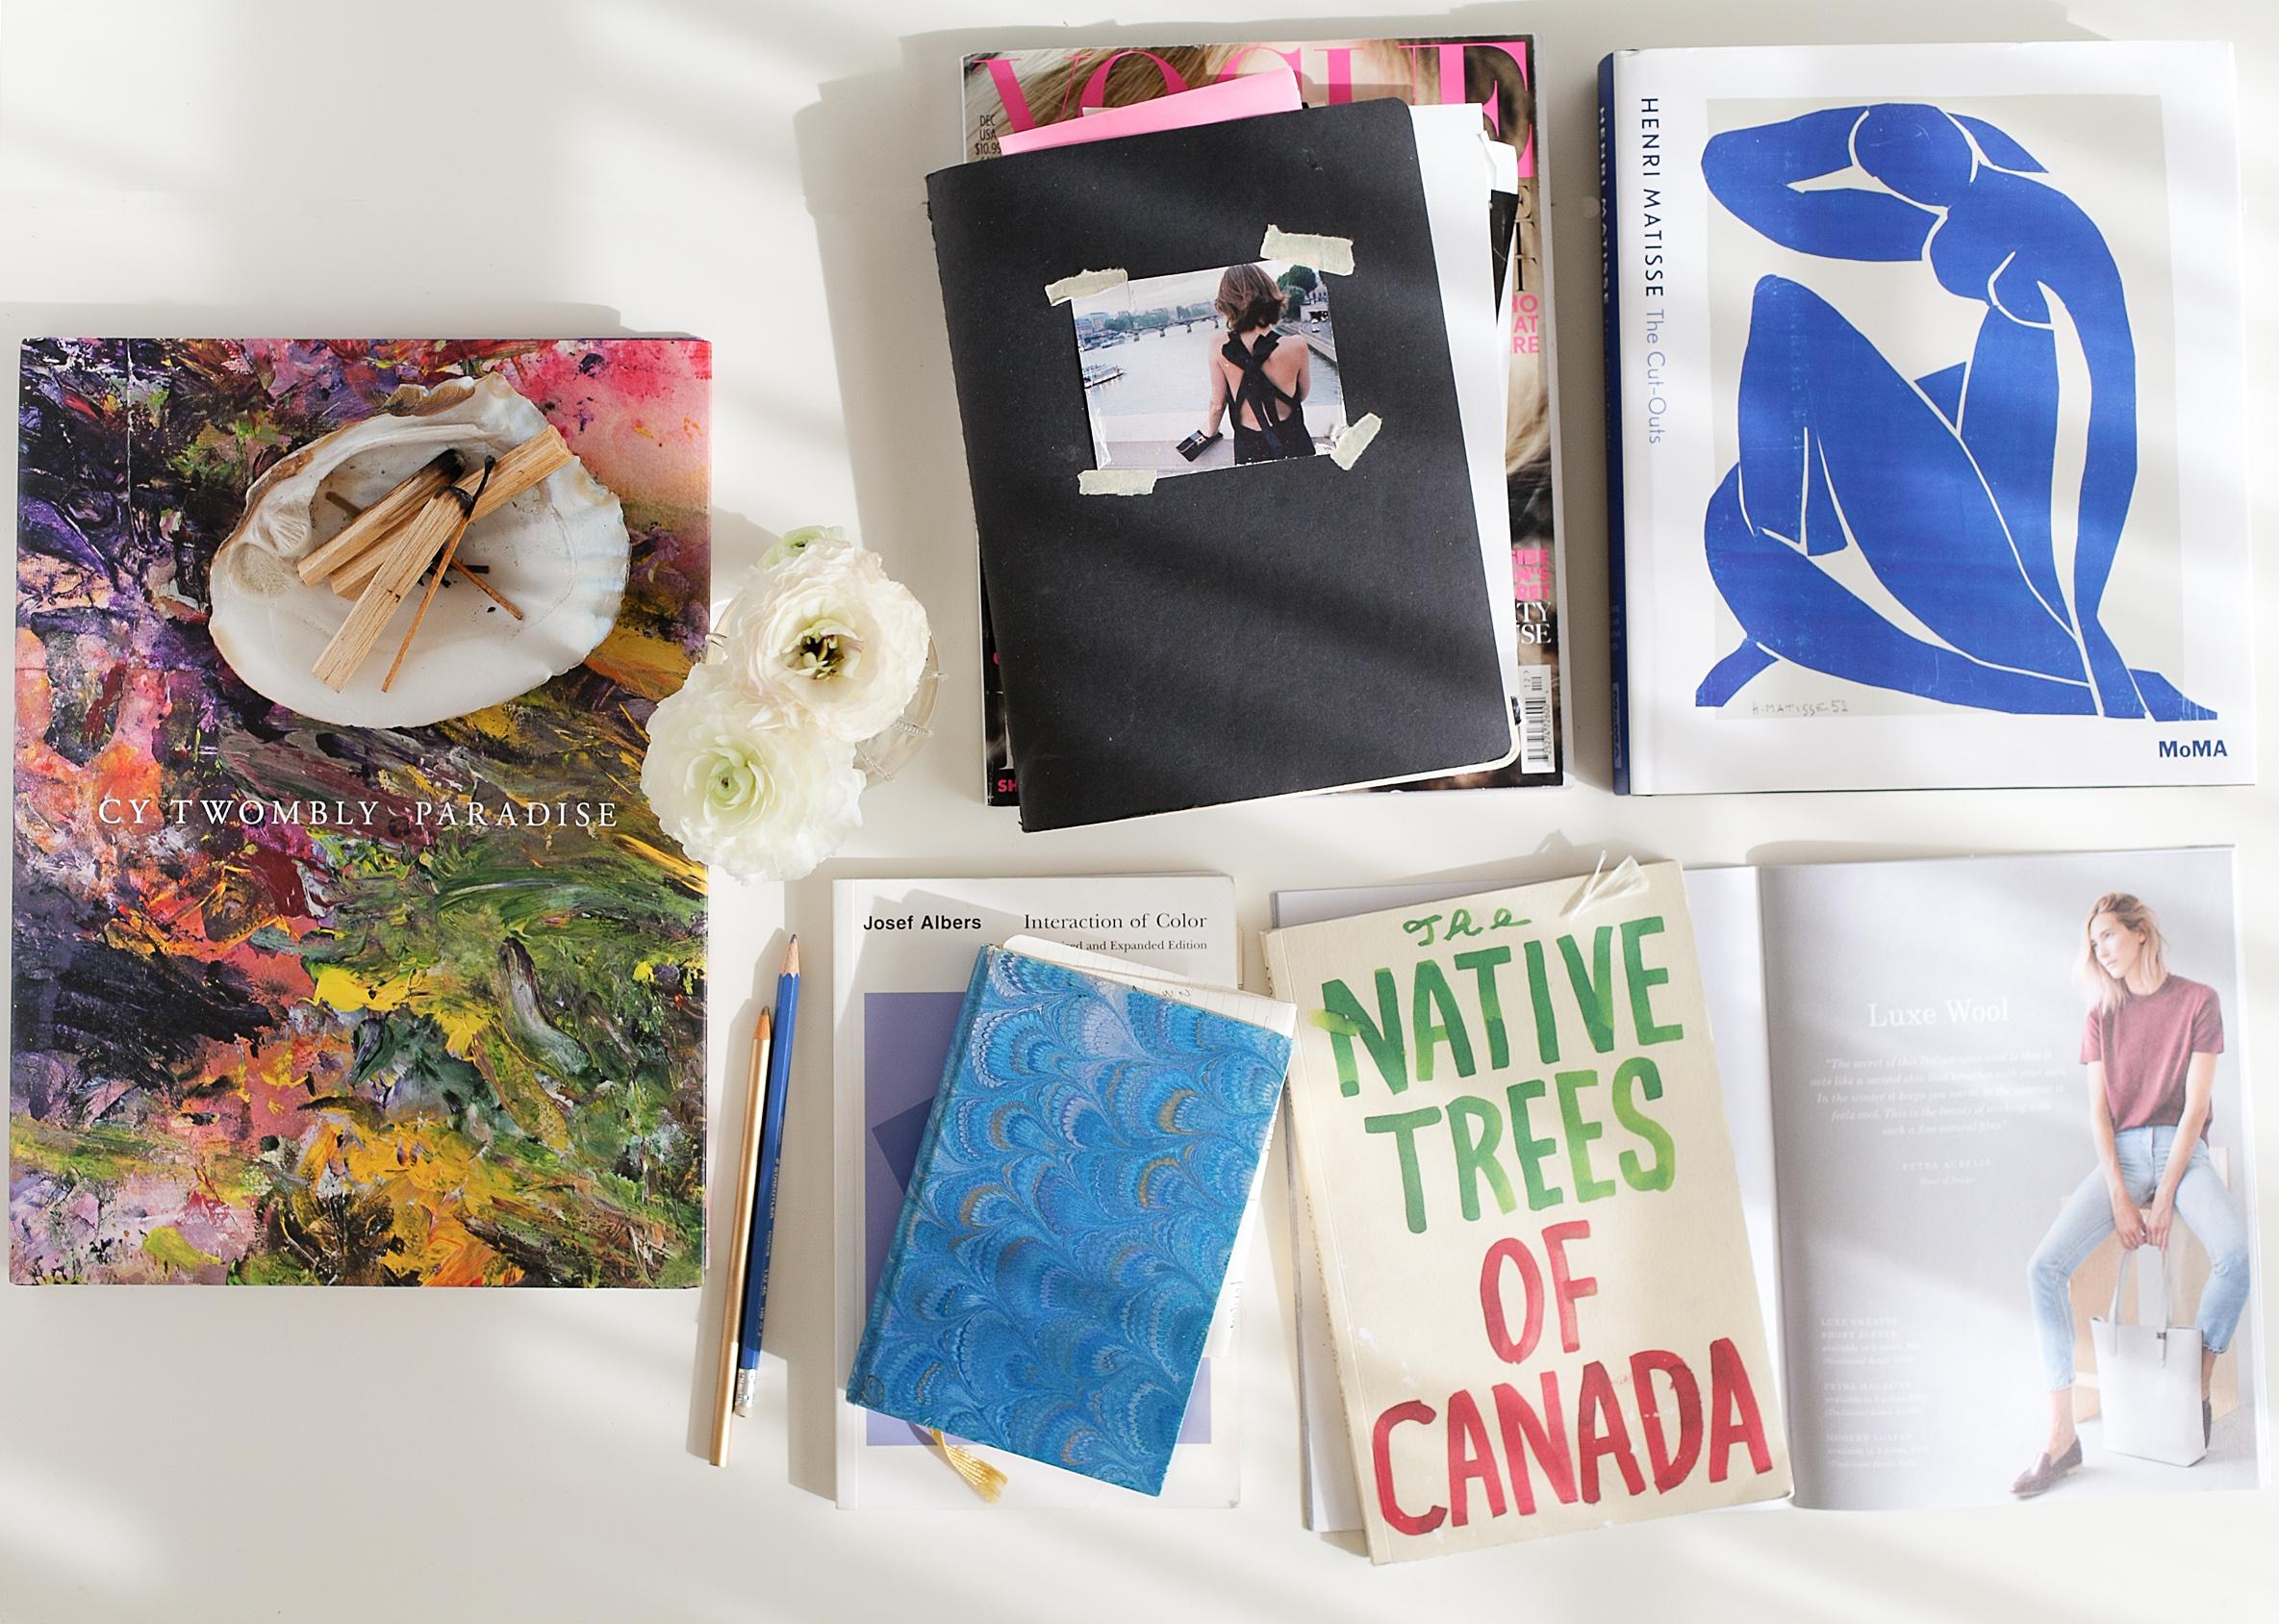 Coffee table books by Naomi Yamada